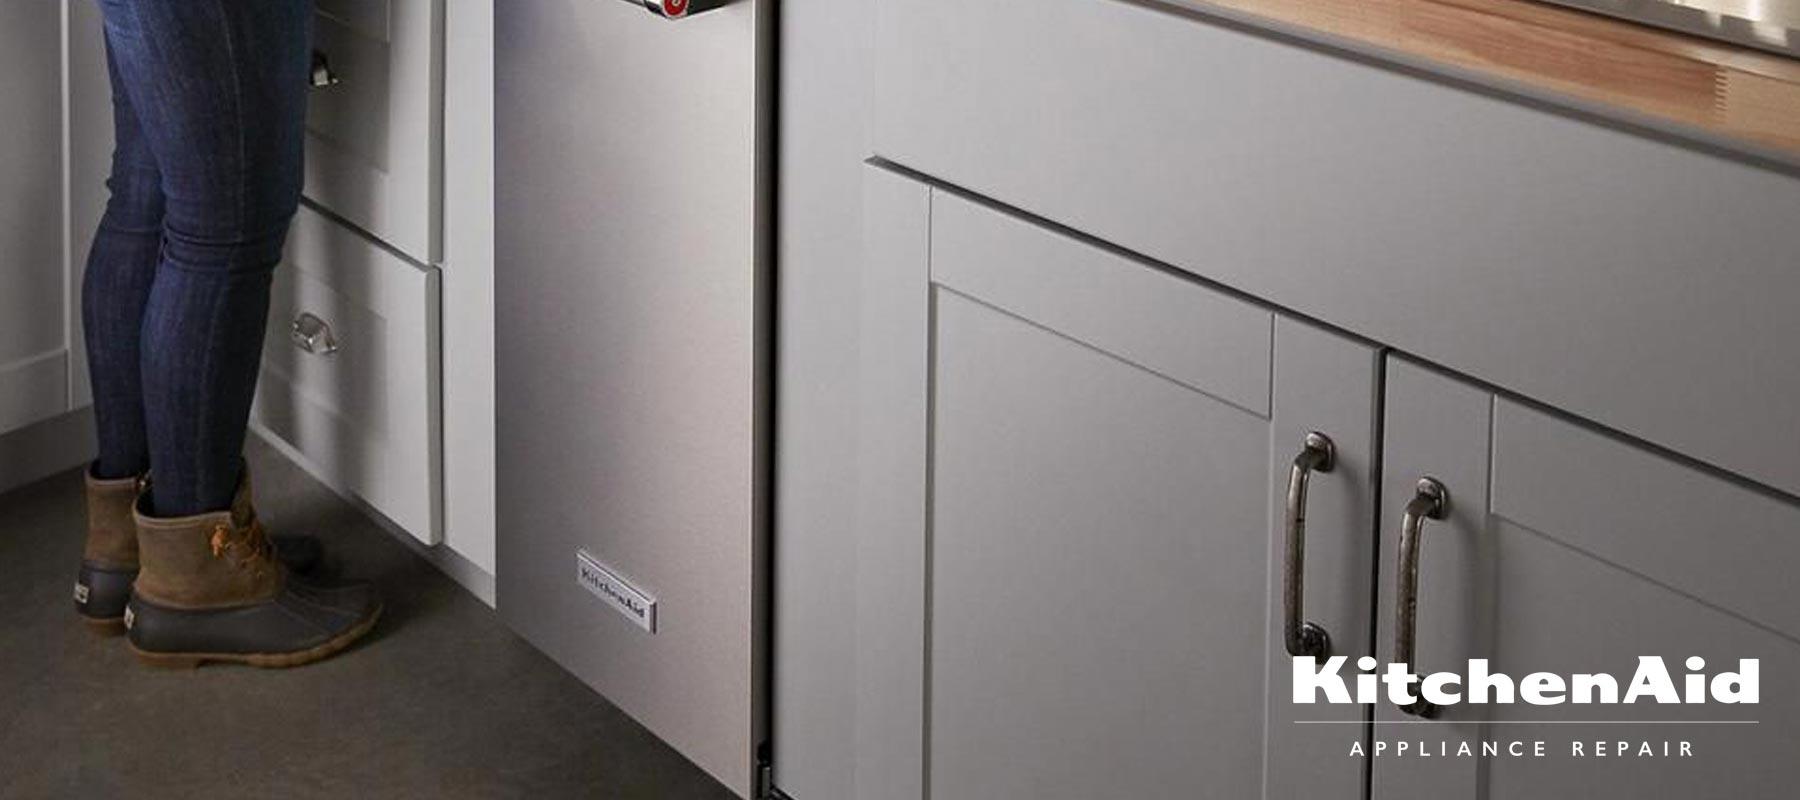 Where to Go for KitchenAid Ice Maker Repair | KitchenAid Appliance Repair Professionals